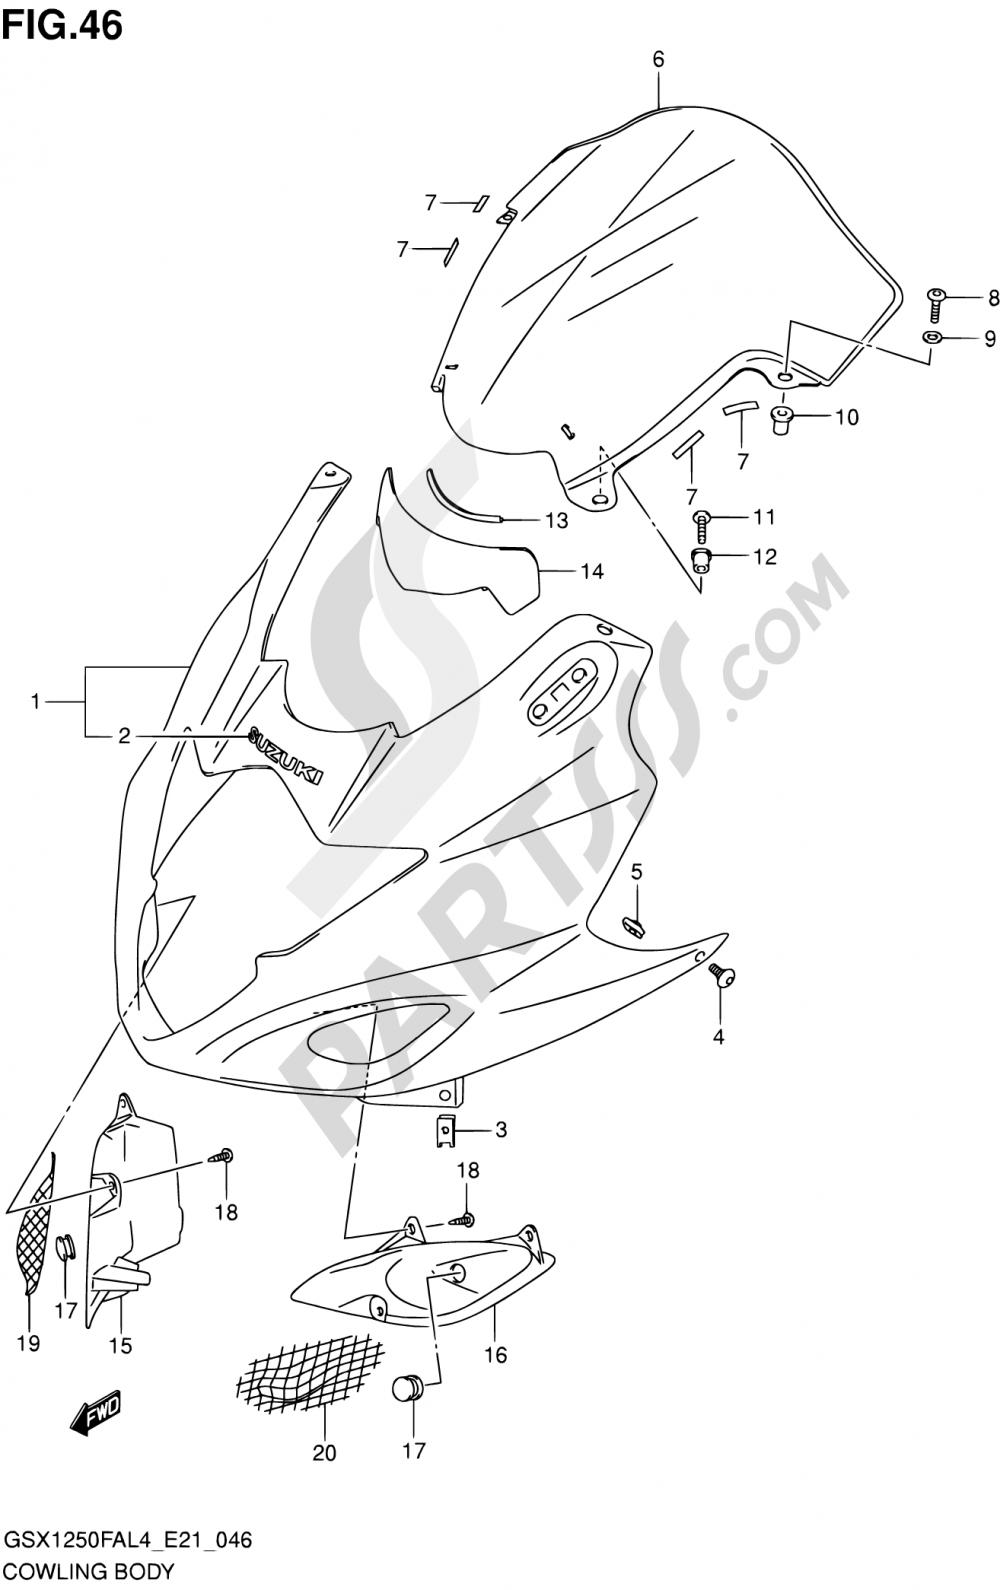 46 - COWLING BODY Suzuki GSX1250FA 2014